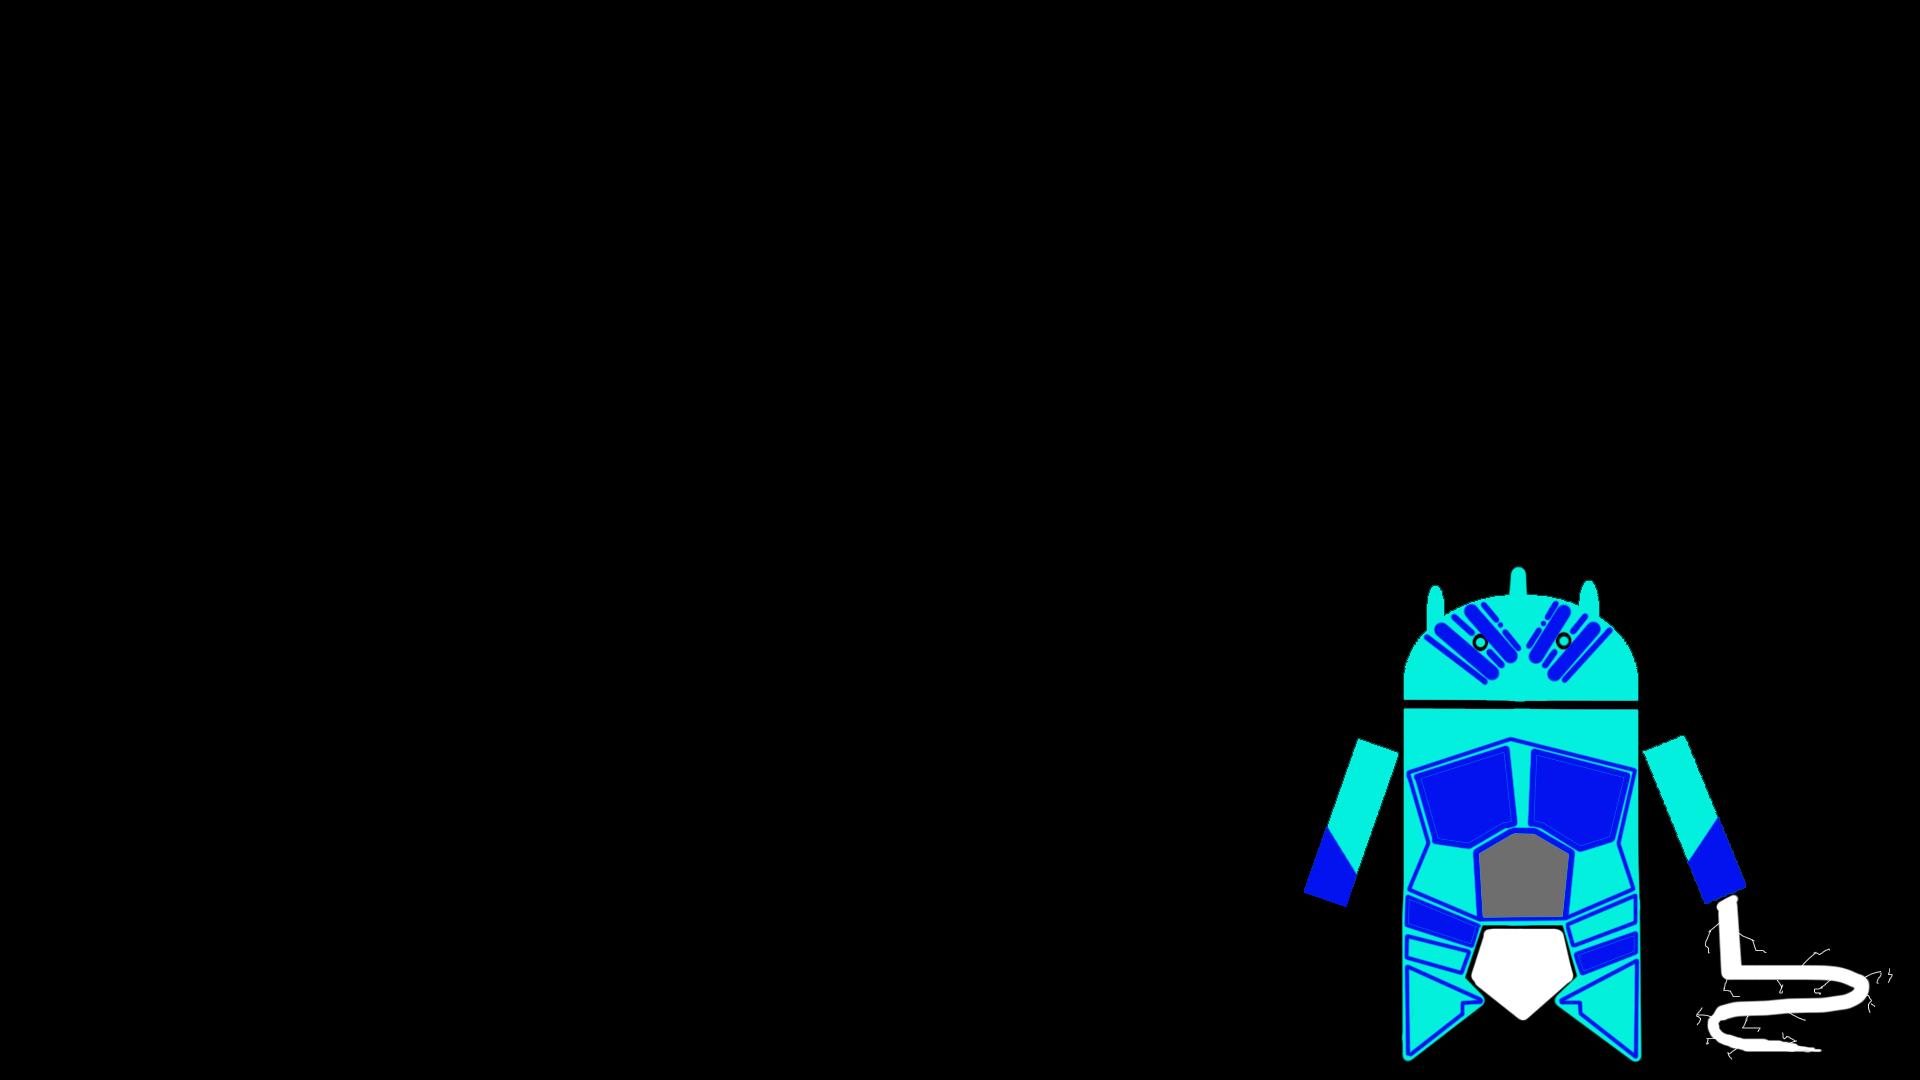 General 1920x1080 Microsoft Windows Android (operating system) Razor Dota 2 cyan black background